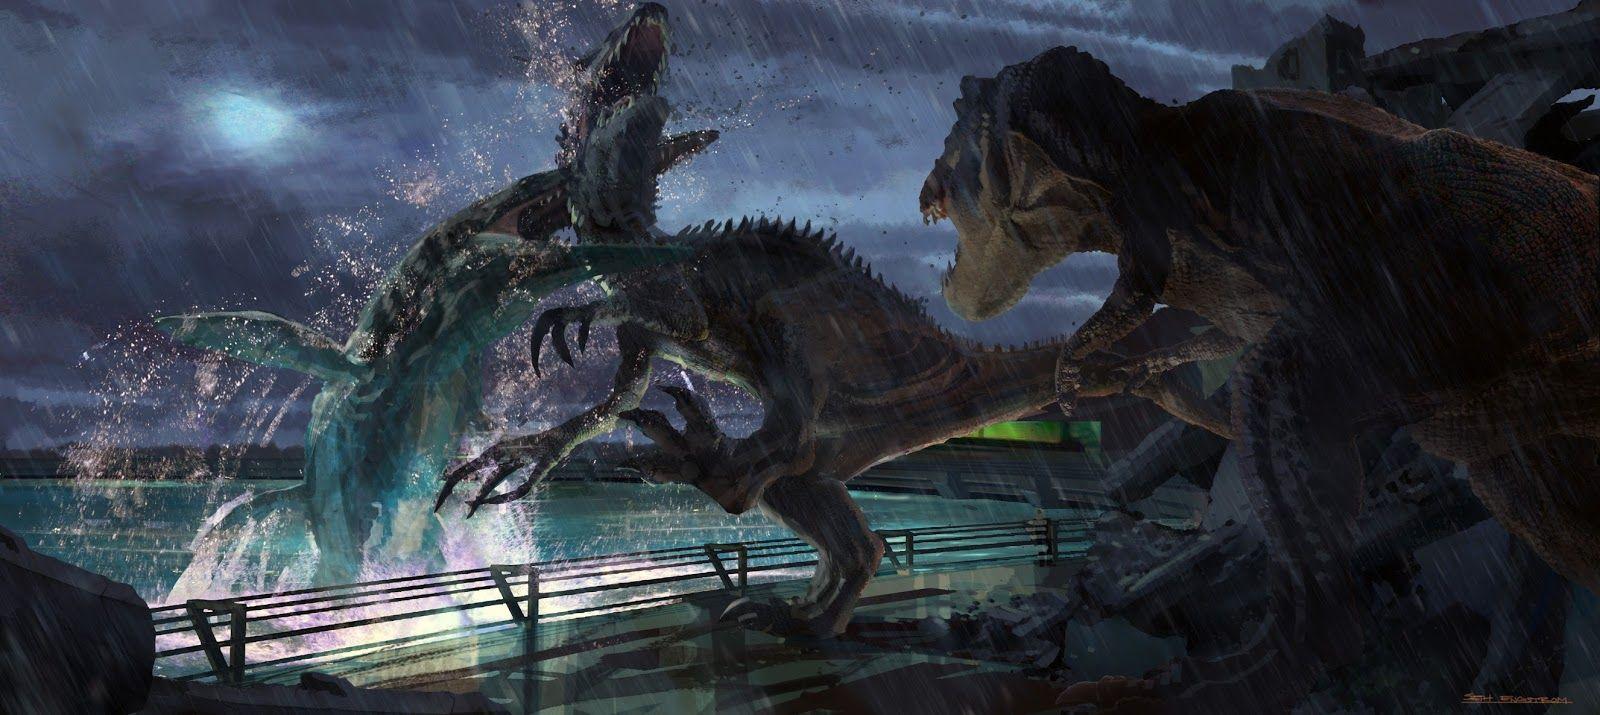 Jurassic World 2 Wallpapers - Wallpaper Cave